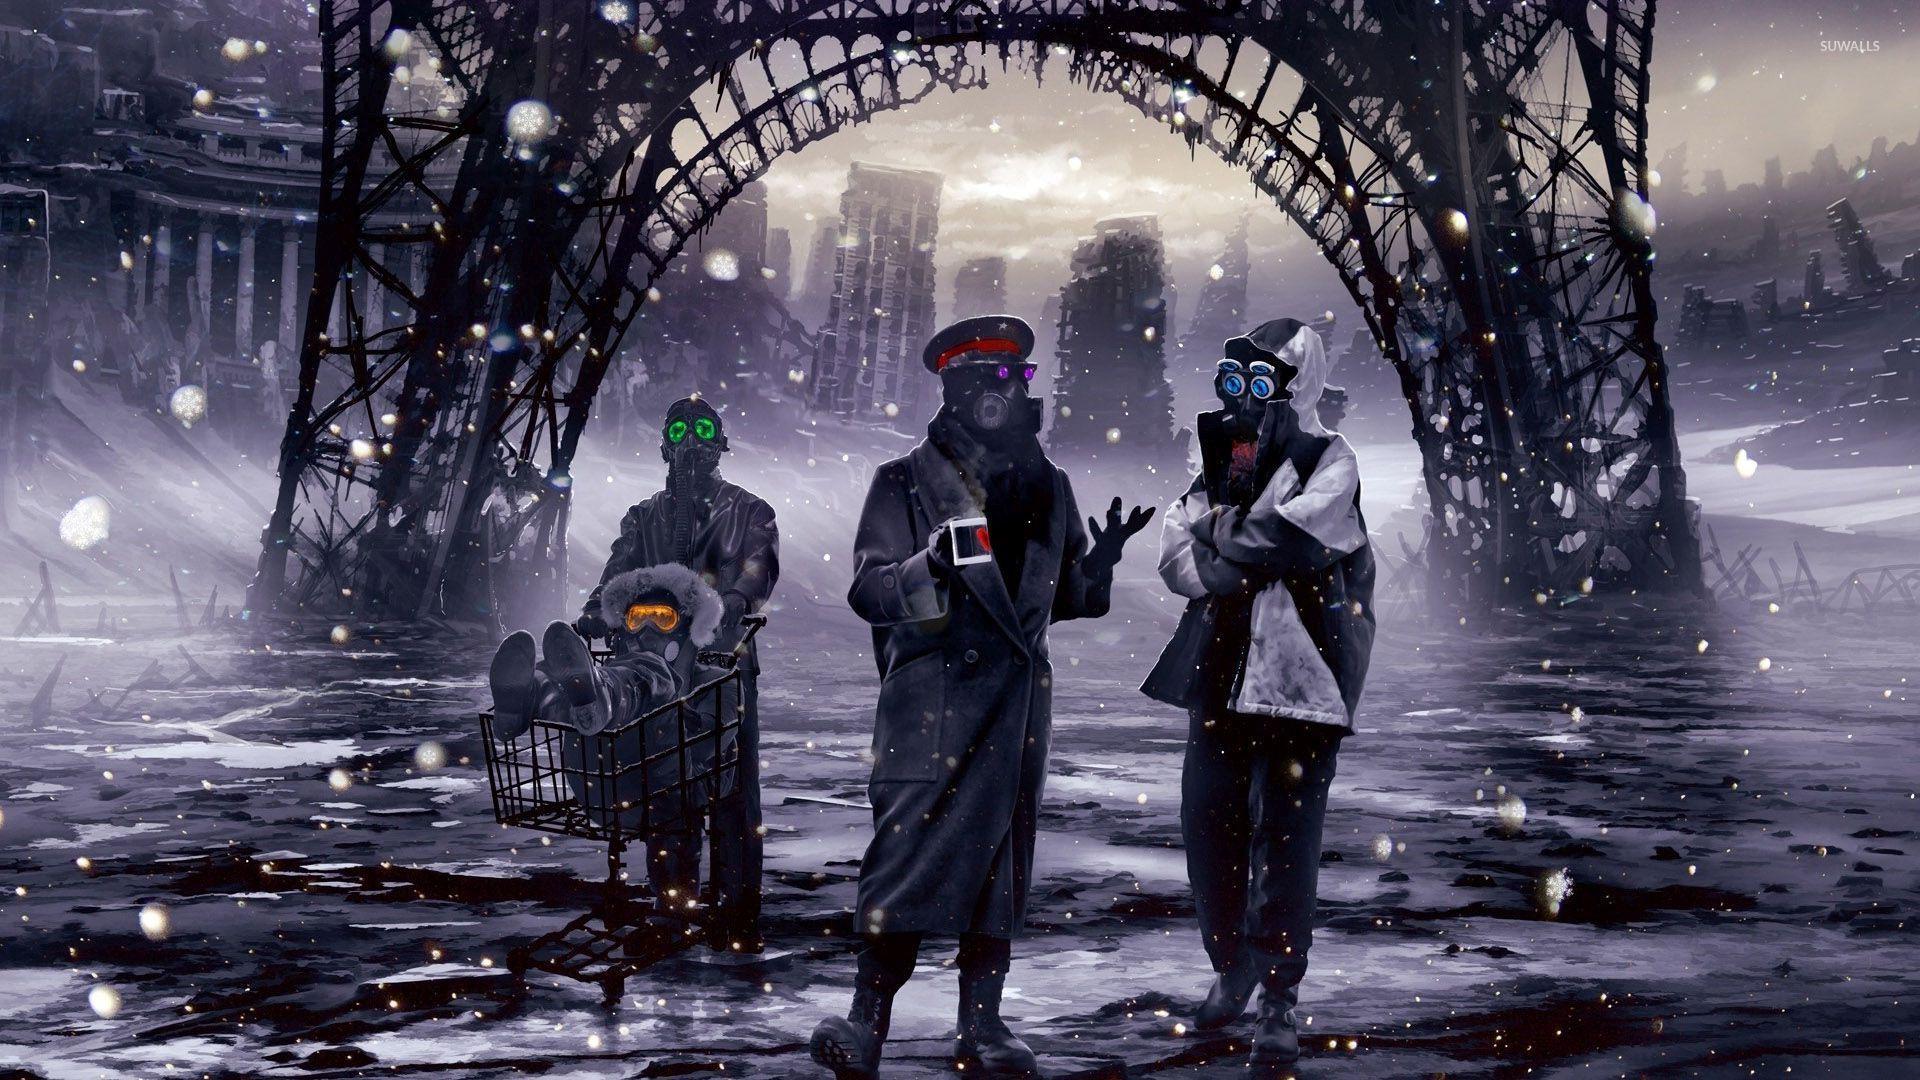 apocalypse in paris wallpaper fantasy wallpapers 46150